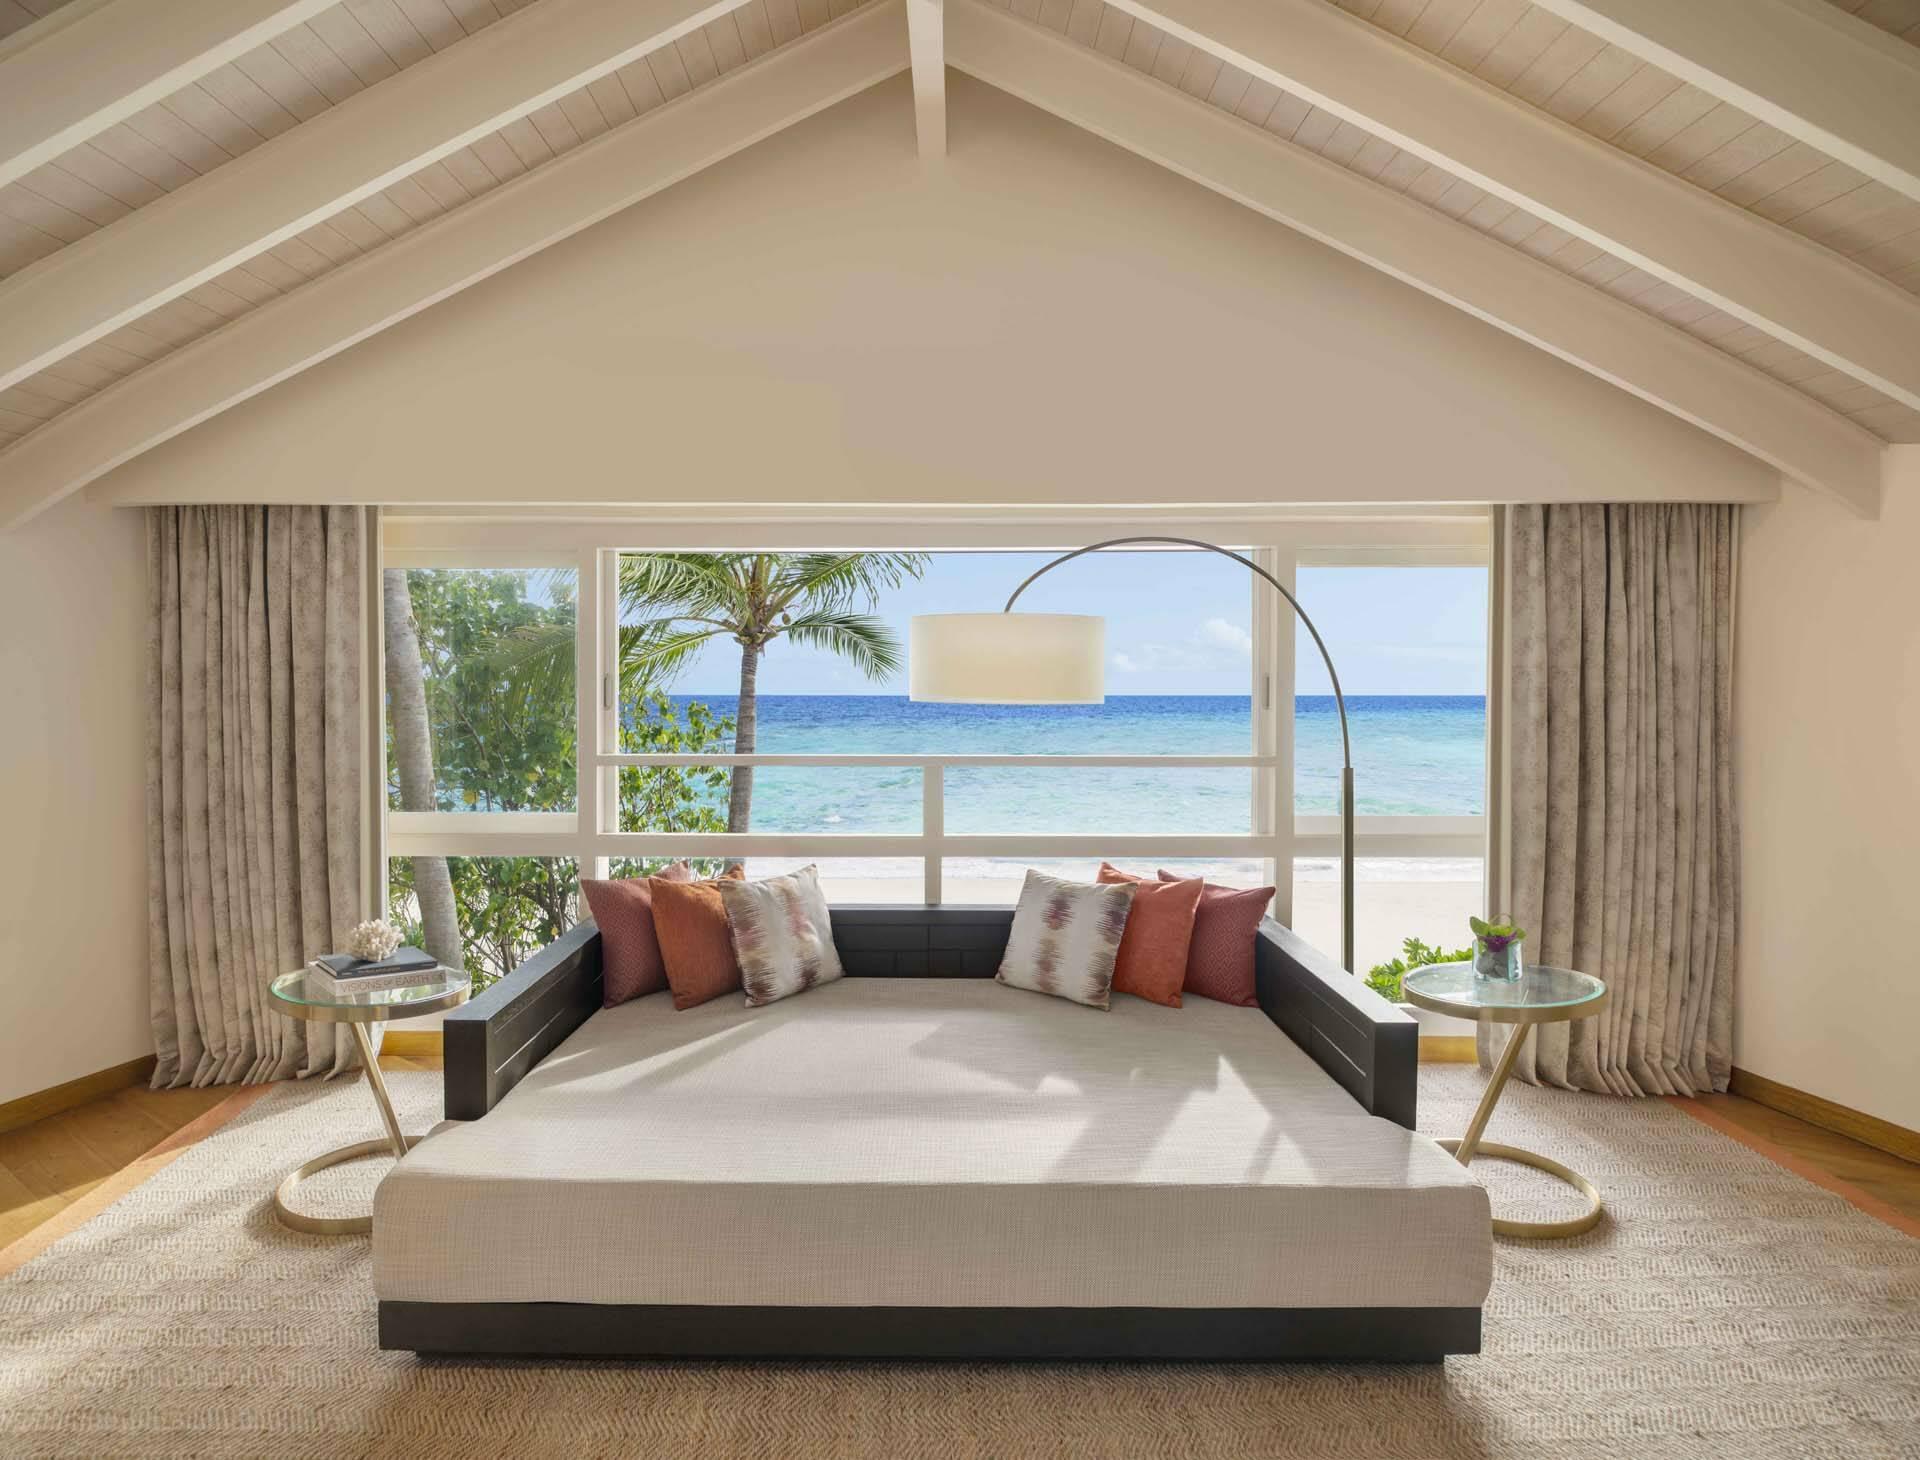 JW Marriott Maldives lounge